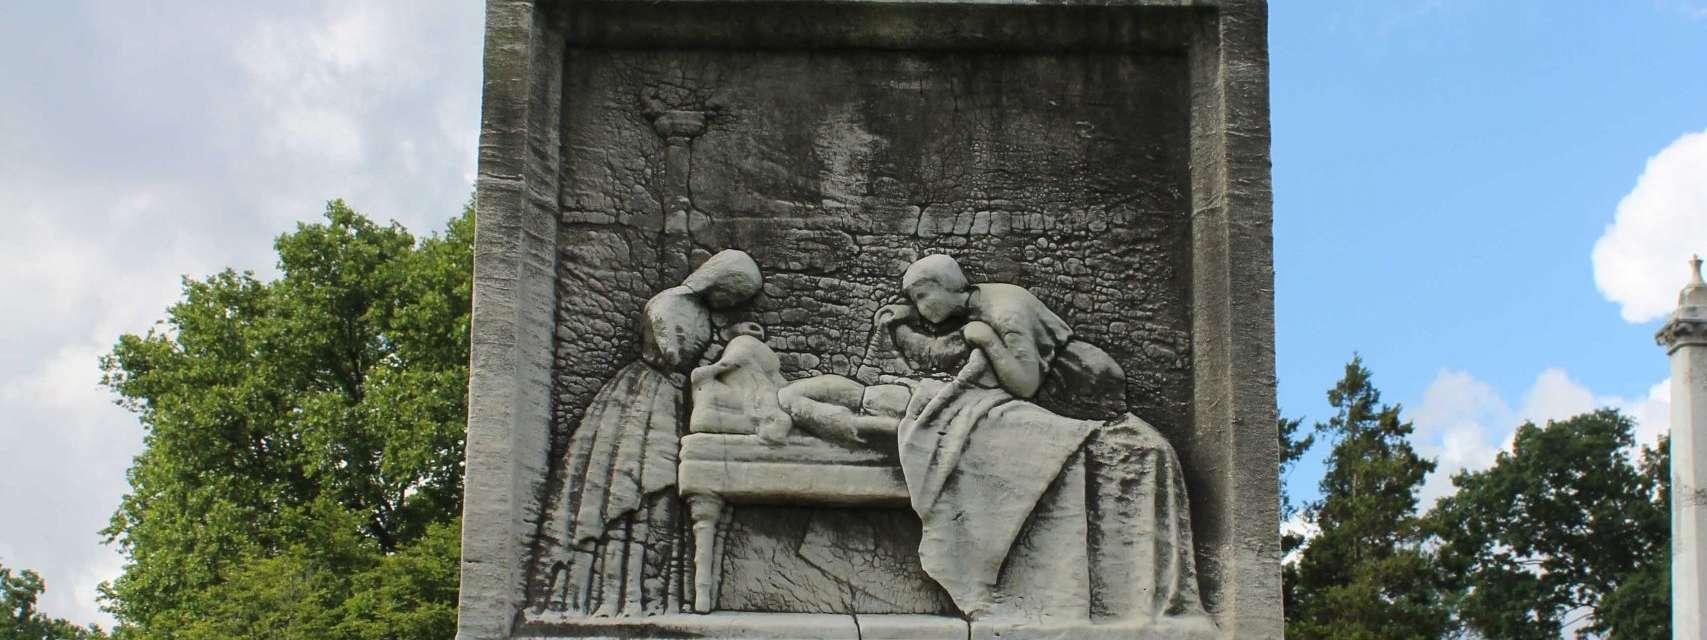 Monument to the Philadelphia Medical Volunteers